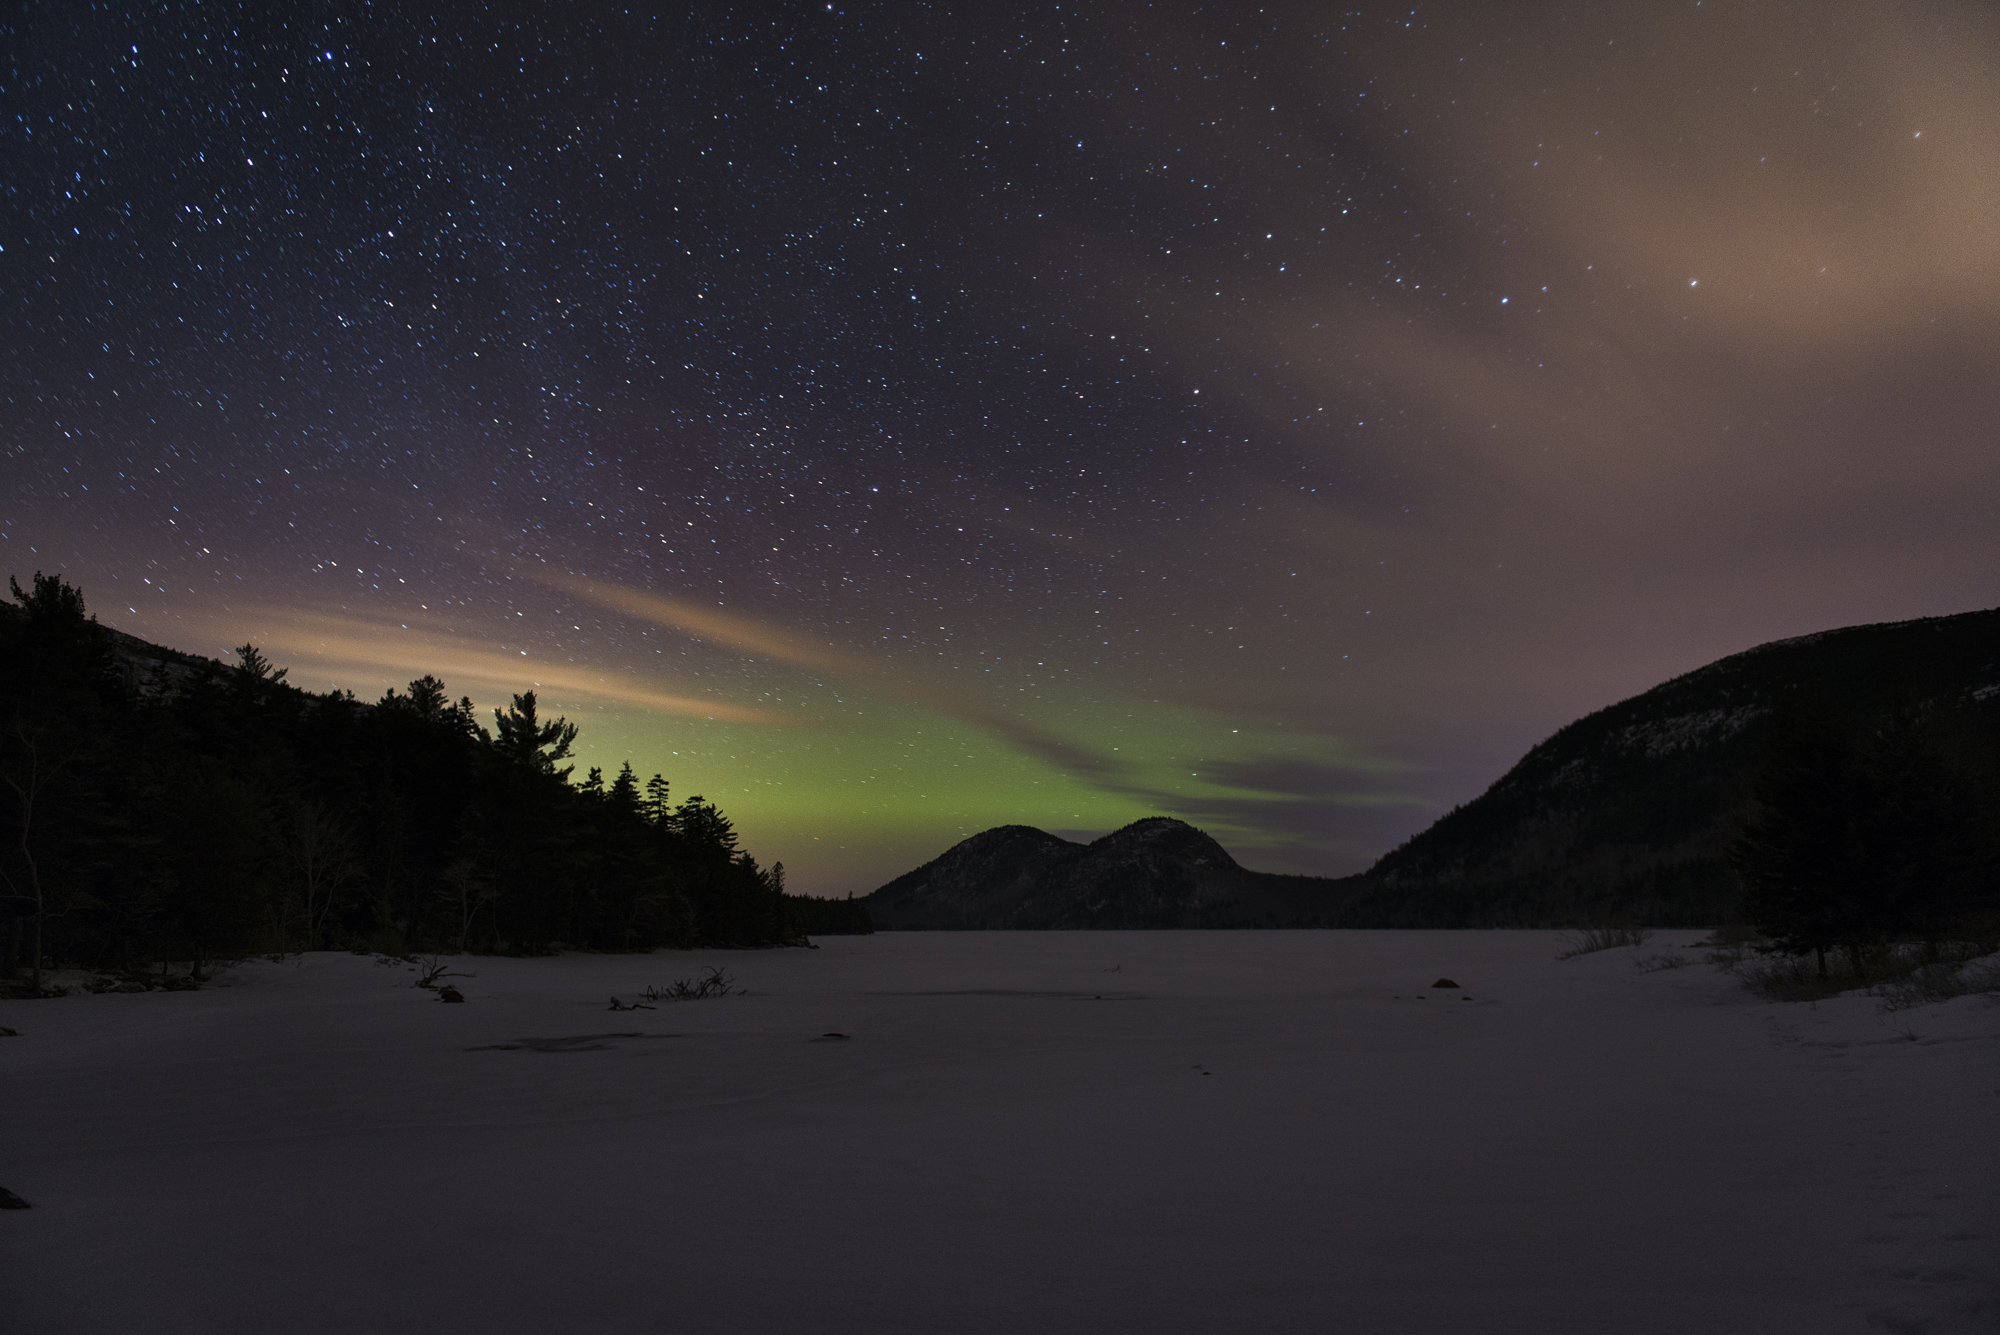 Aurora at Jordan Pond, Acadia National Park, Night Sky Photography